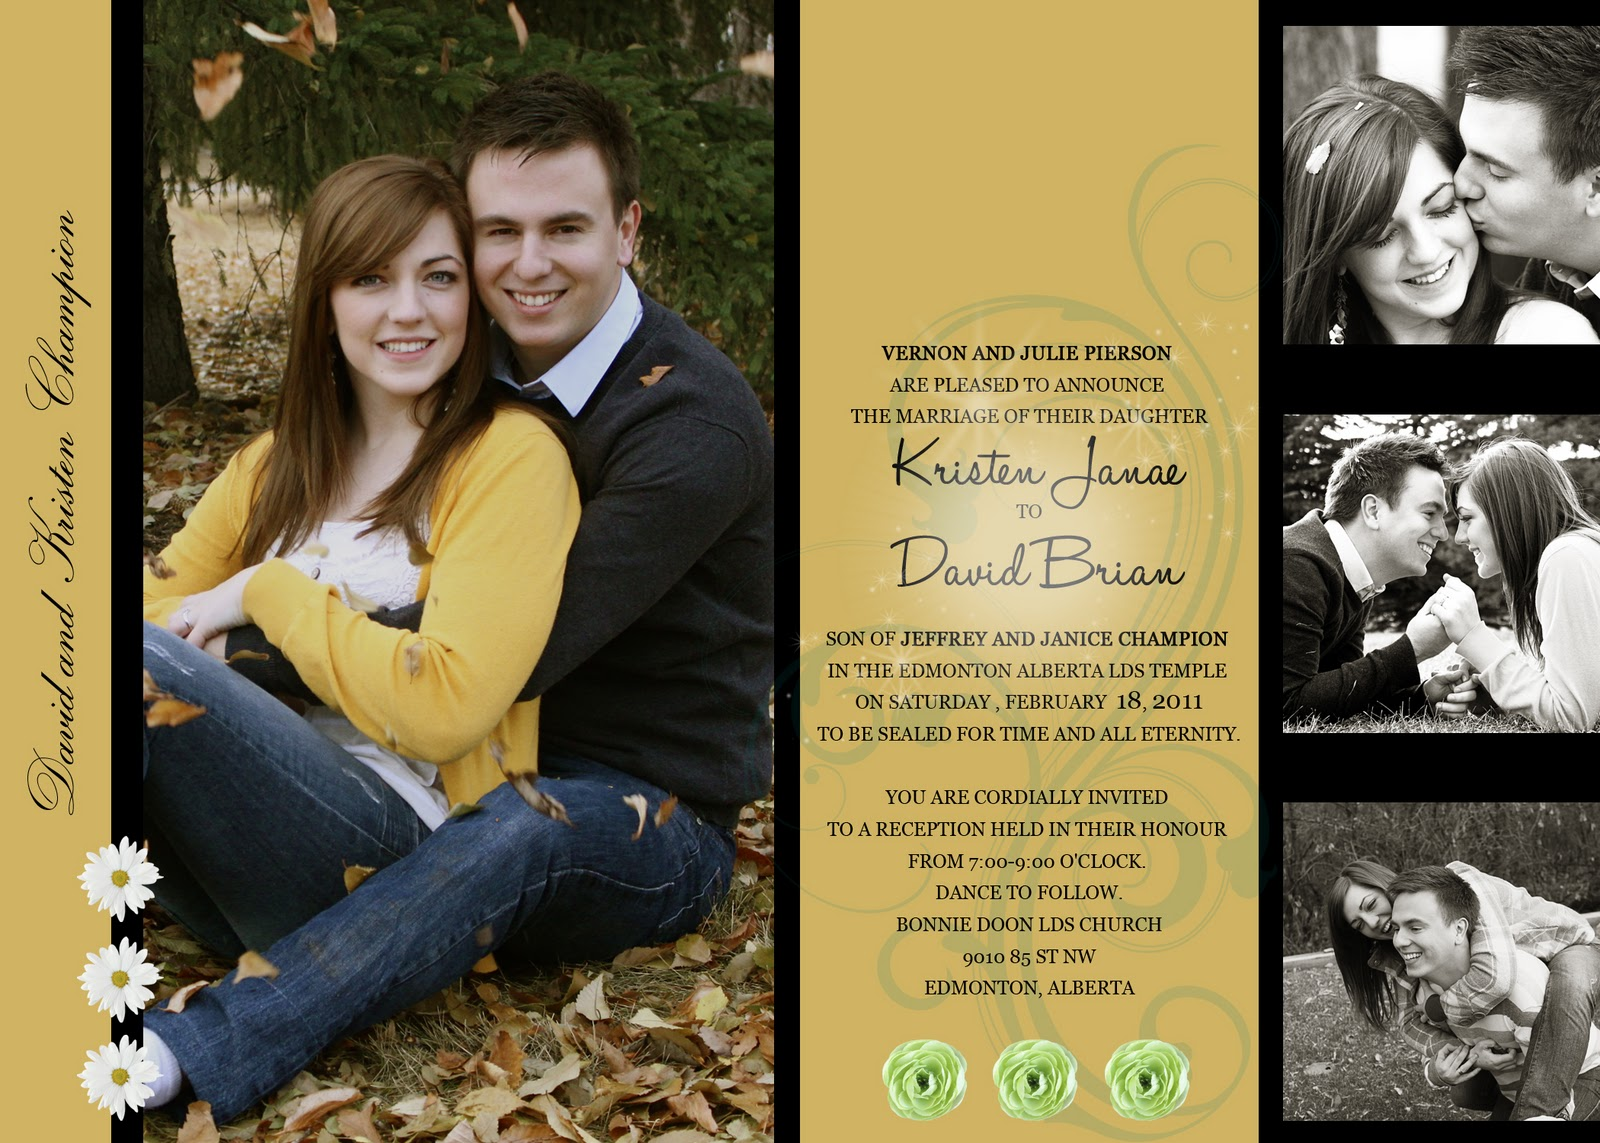 Canadian Wedding Invitations: From British Columbia Canada.....: WEDDING INVITATIONS